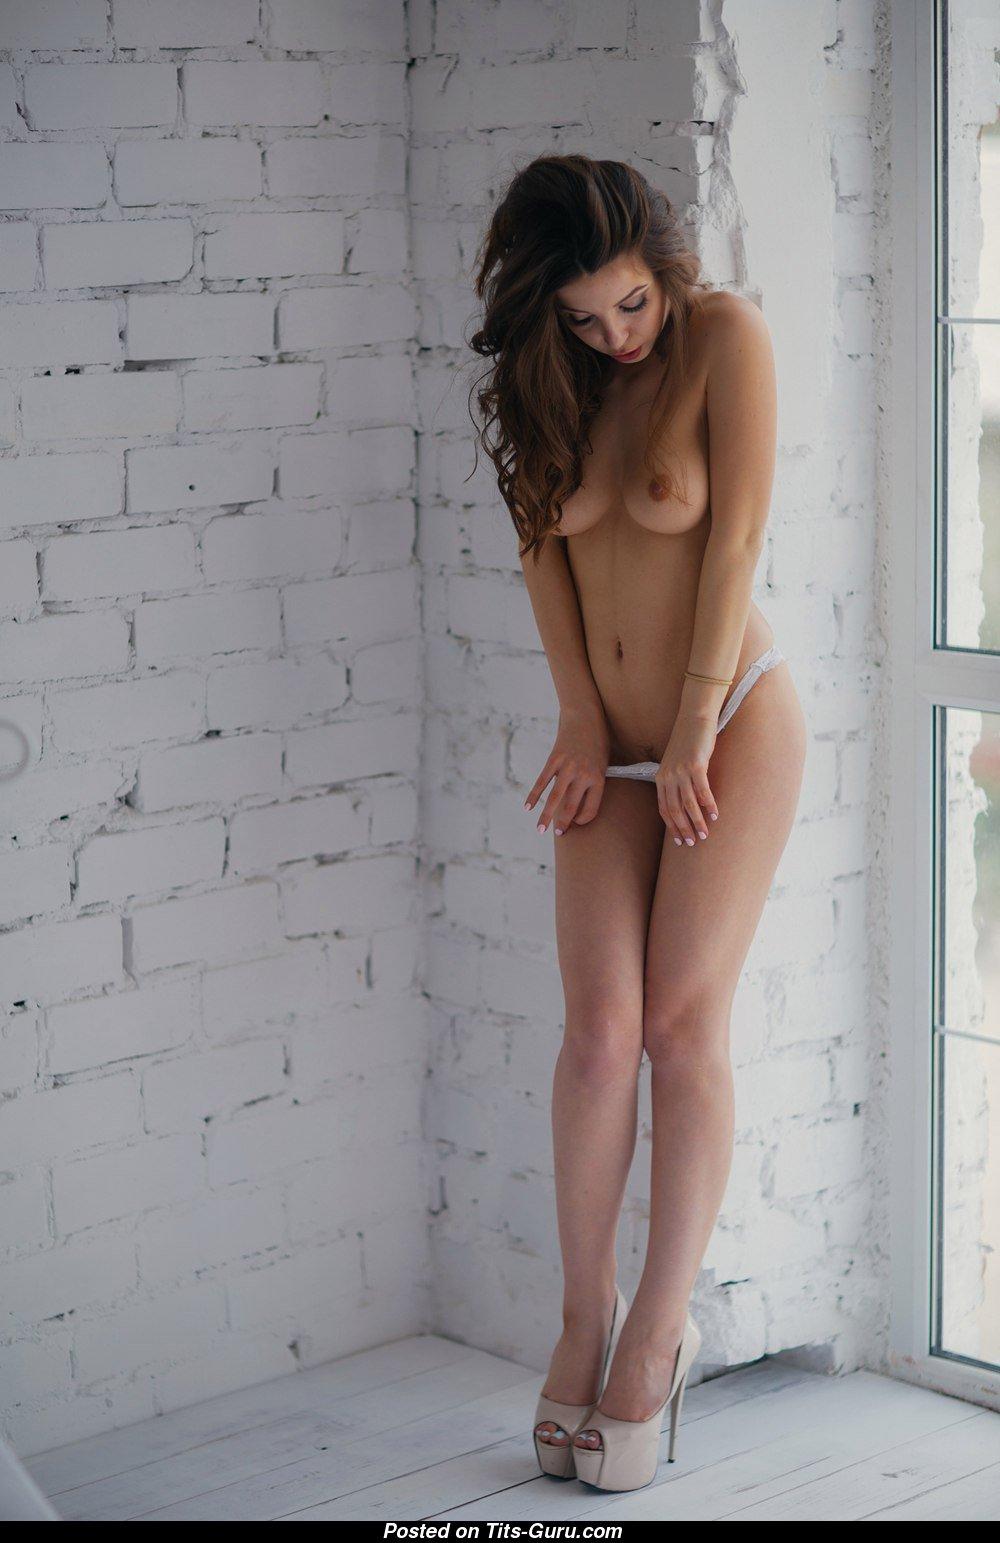 XXX Karina Avakyan naked (19 photos), Tits, Cleavage, Selfie, panties 2006